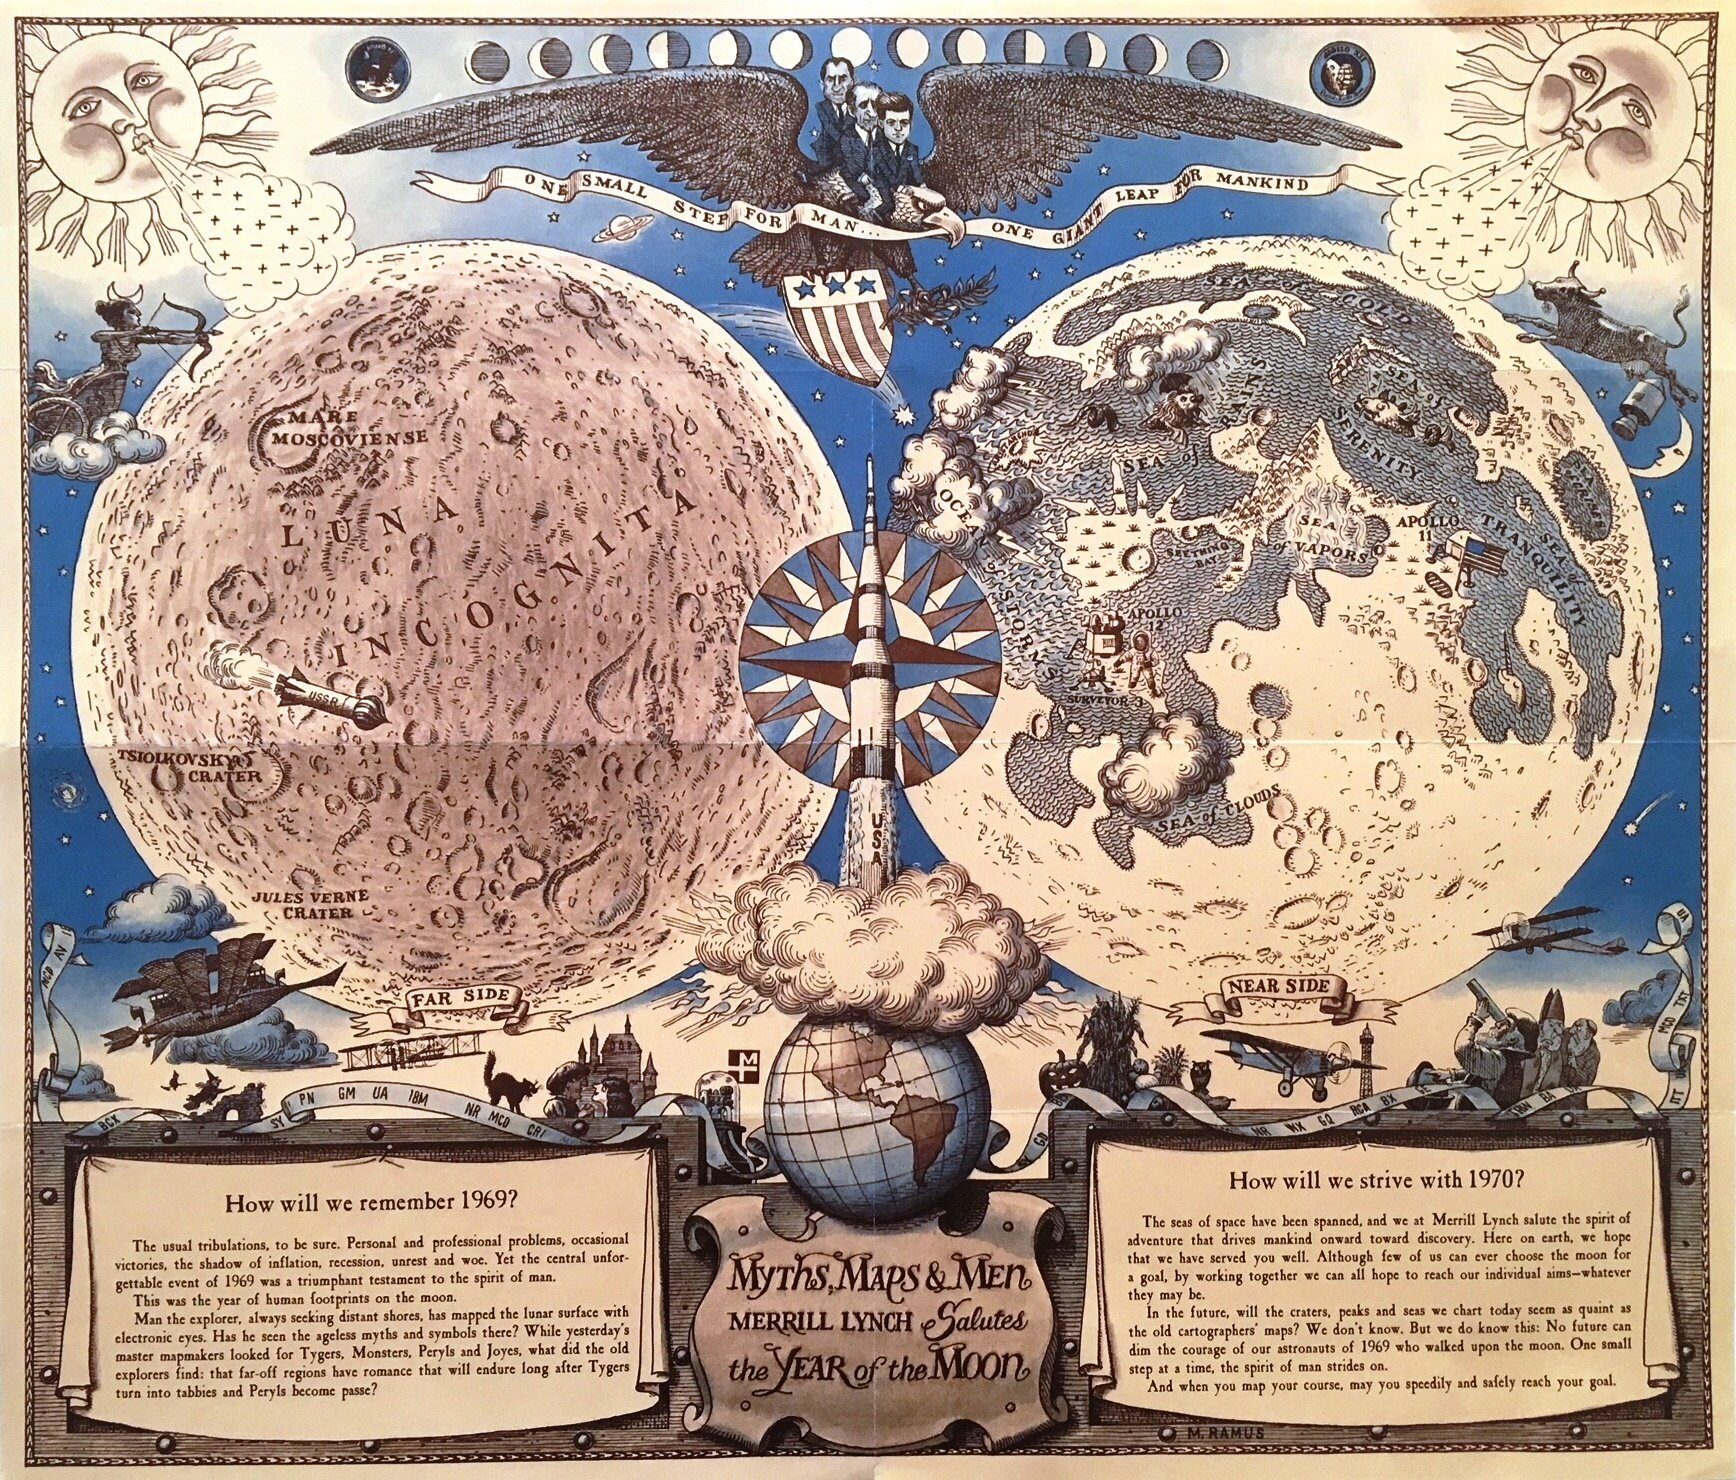 Figure 11.16 Merrill Lynch Moon 1969.jpg